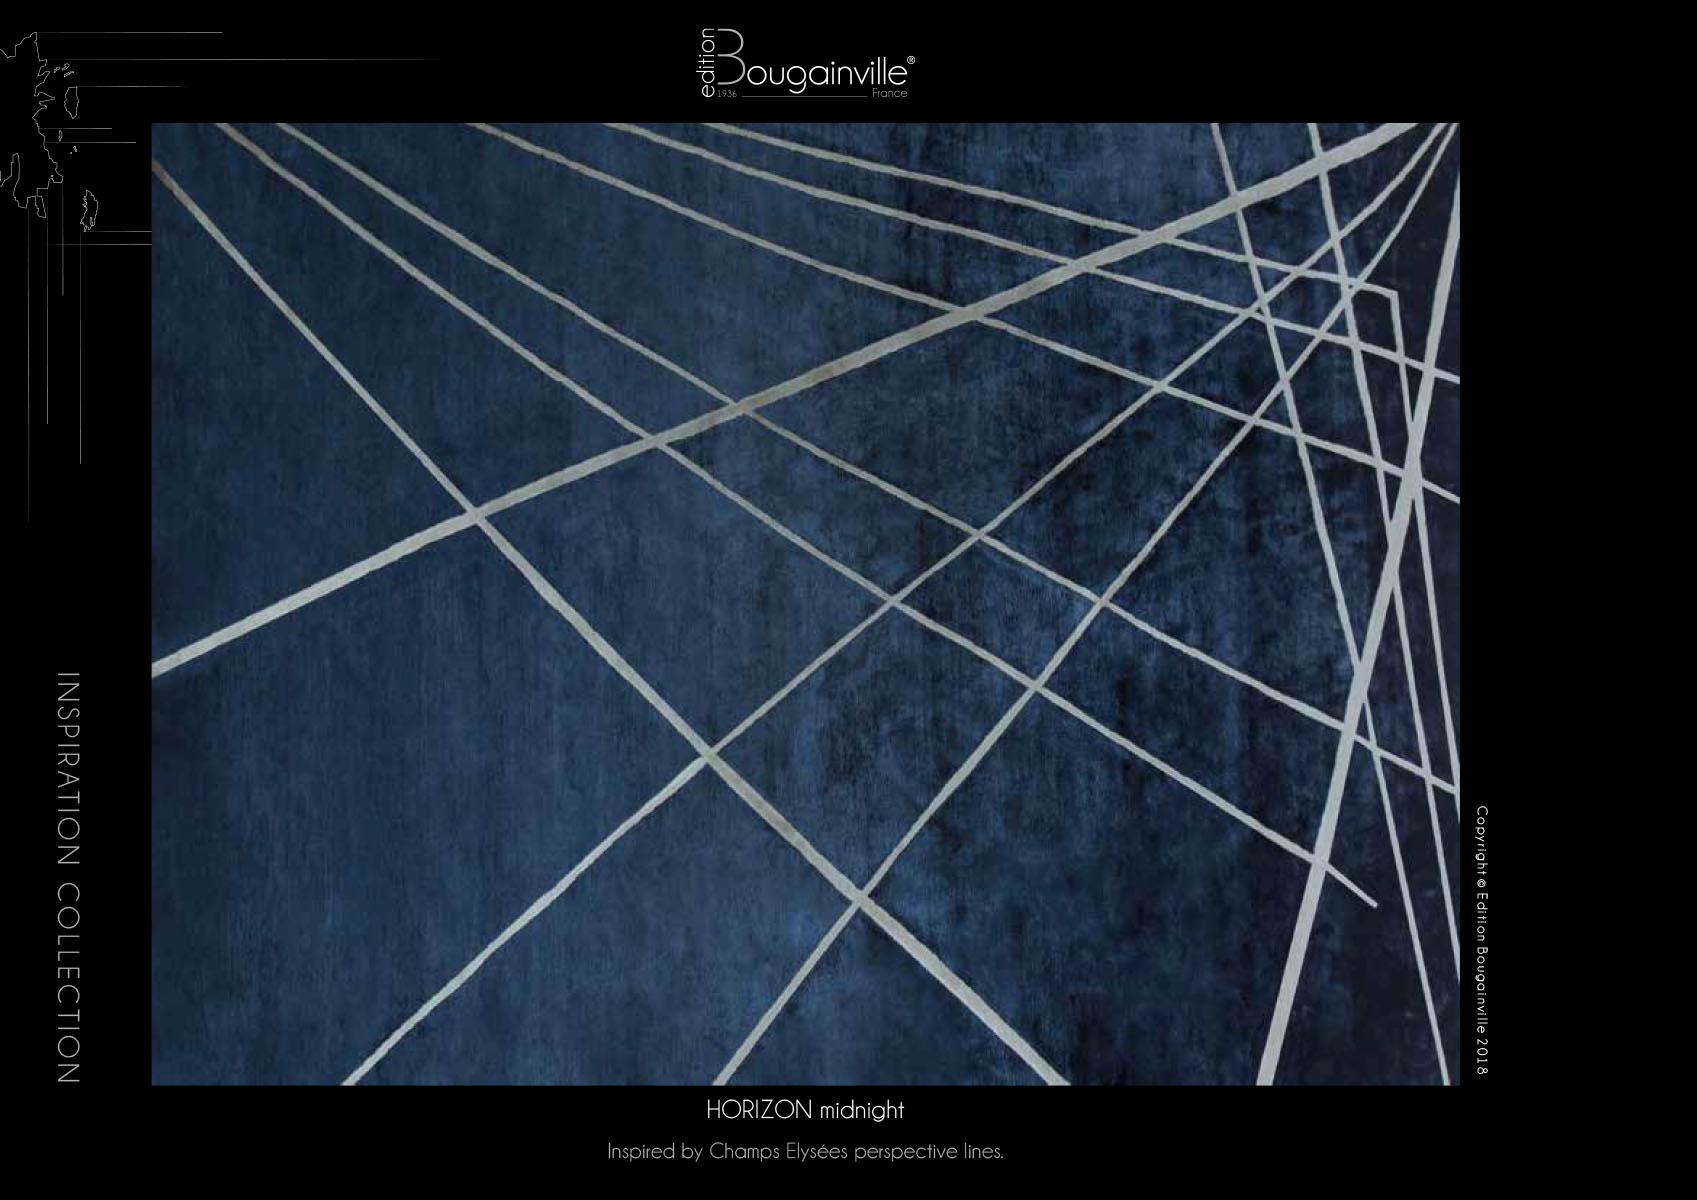 Ковер Edition Bougainville, HORIZON midnight